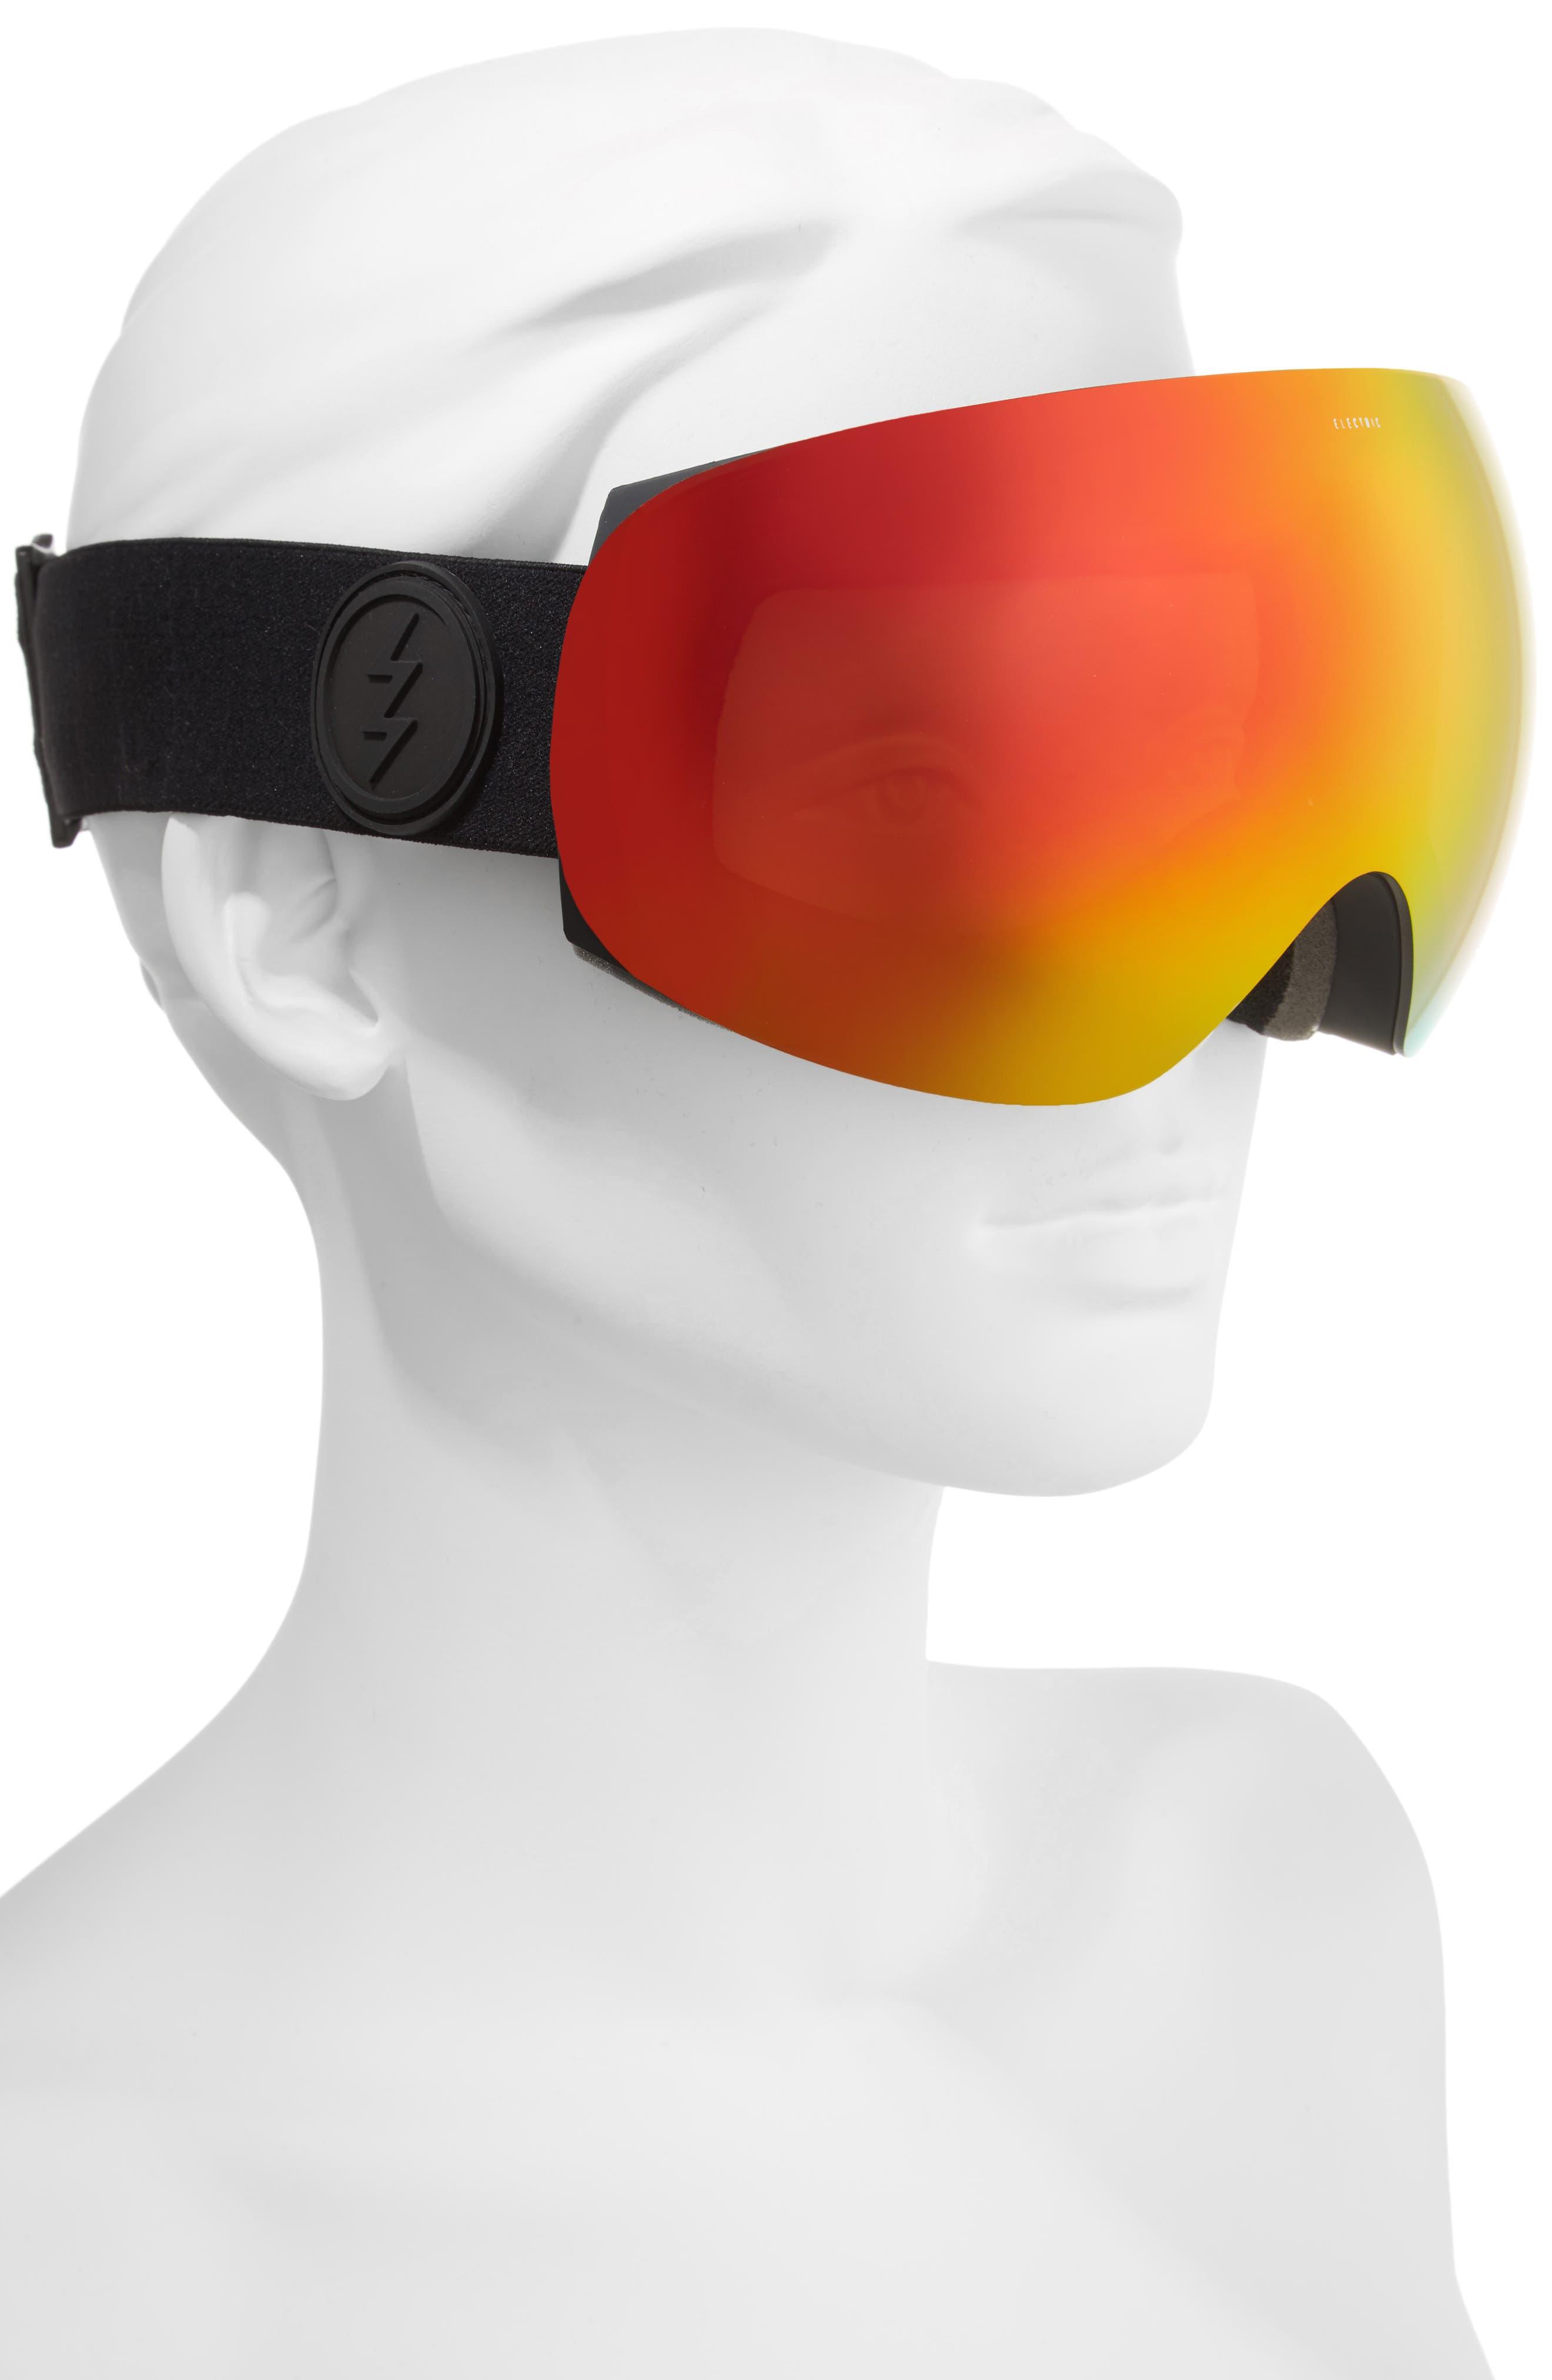 EG3 Snow Goggles,                             Alternate thumbnail 2, color,                             001